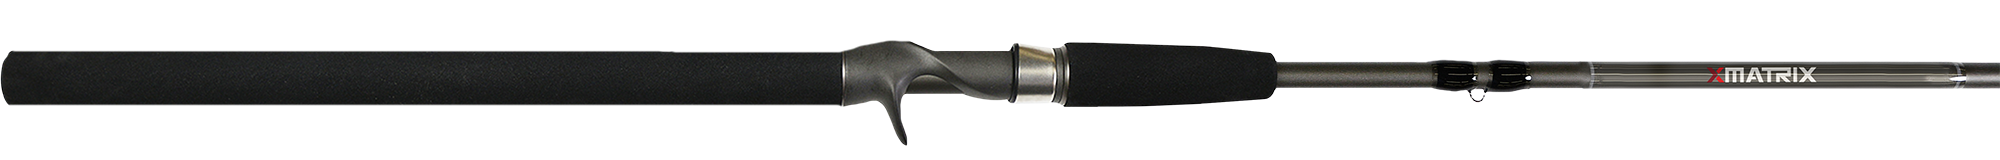 Douglas Outdoors Casting Rods Xmatrix Handle Full